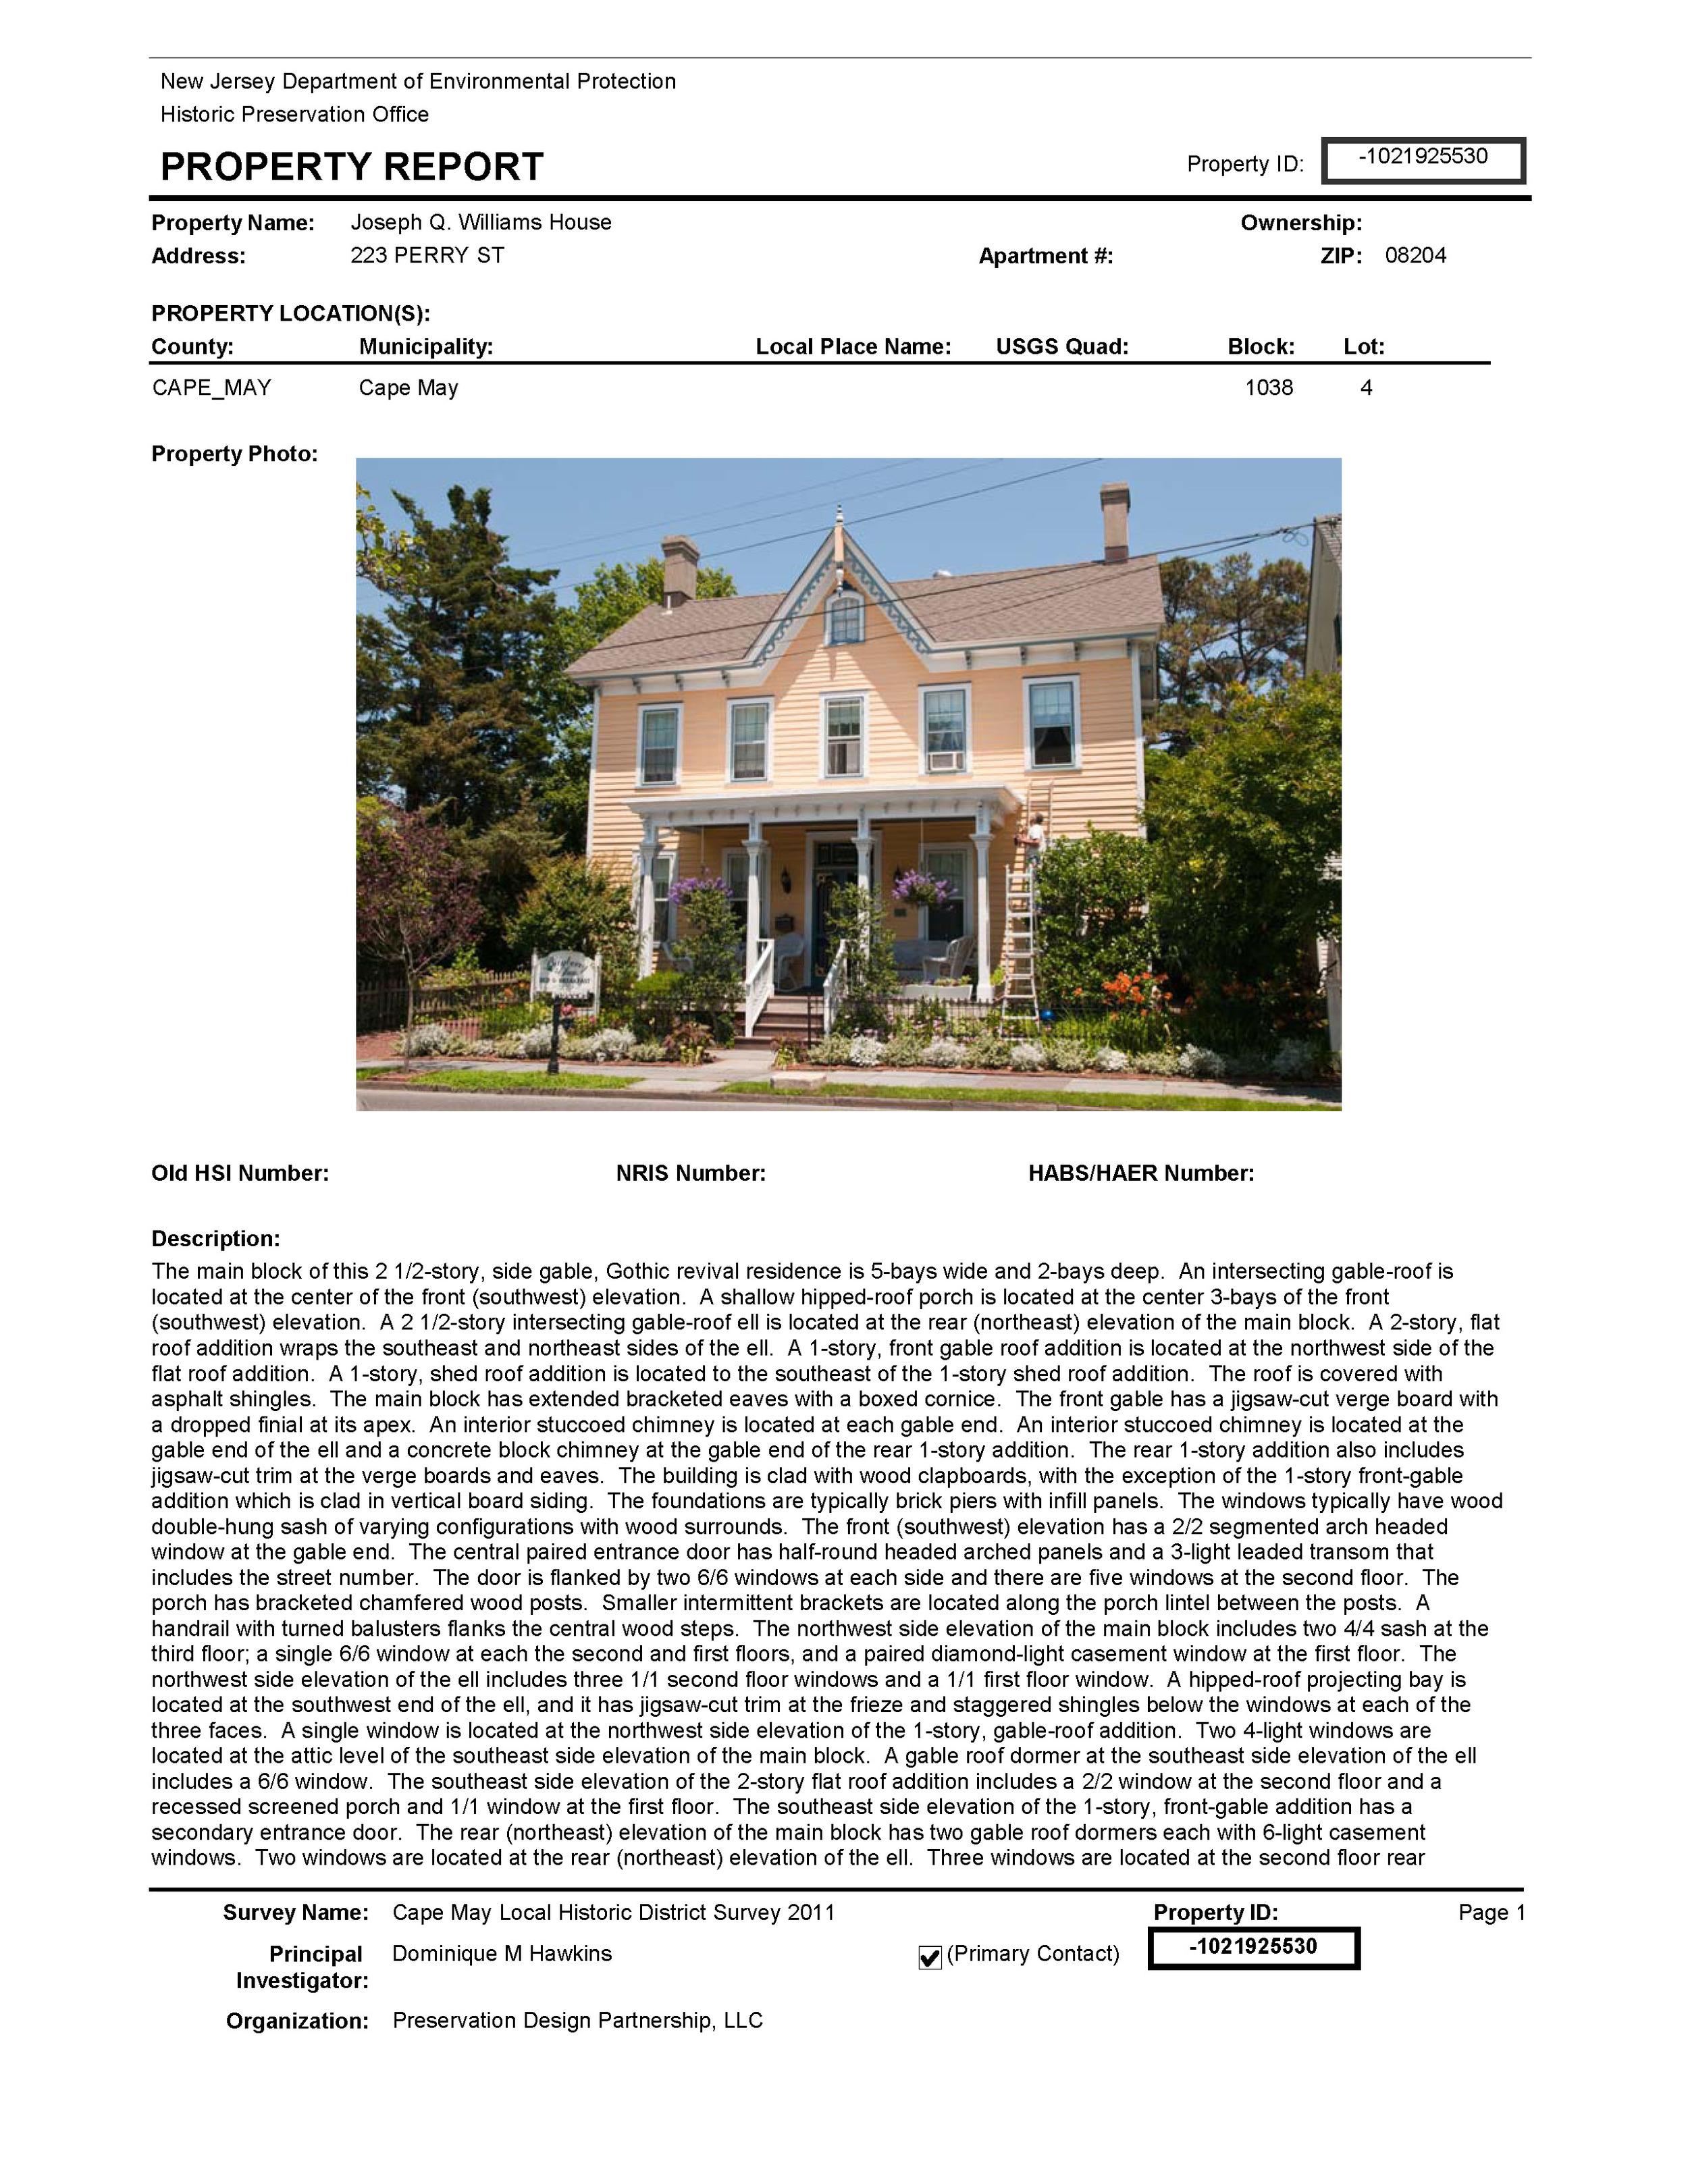 1038_JOSEPH Q WILLIAMS HOUSE [-1021925530]_Page_1.jpg